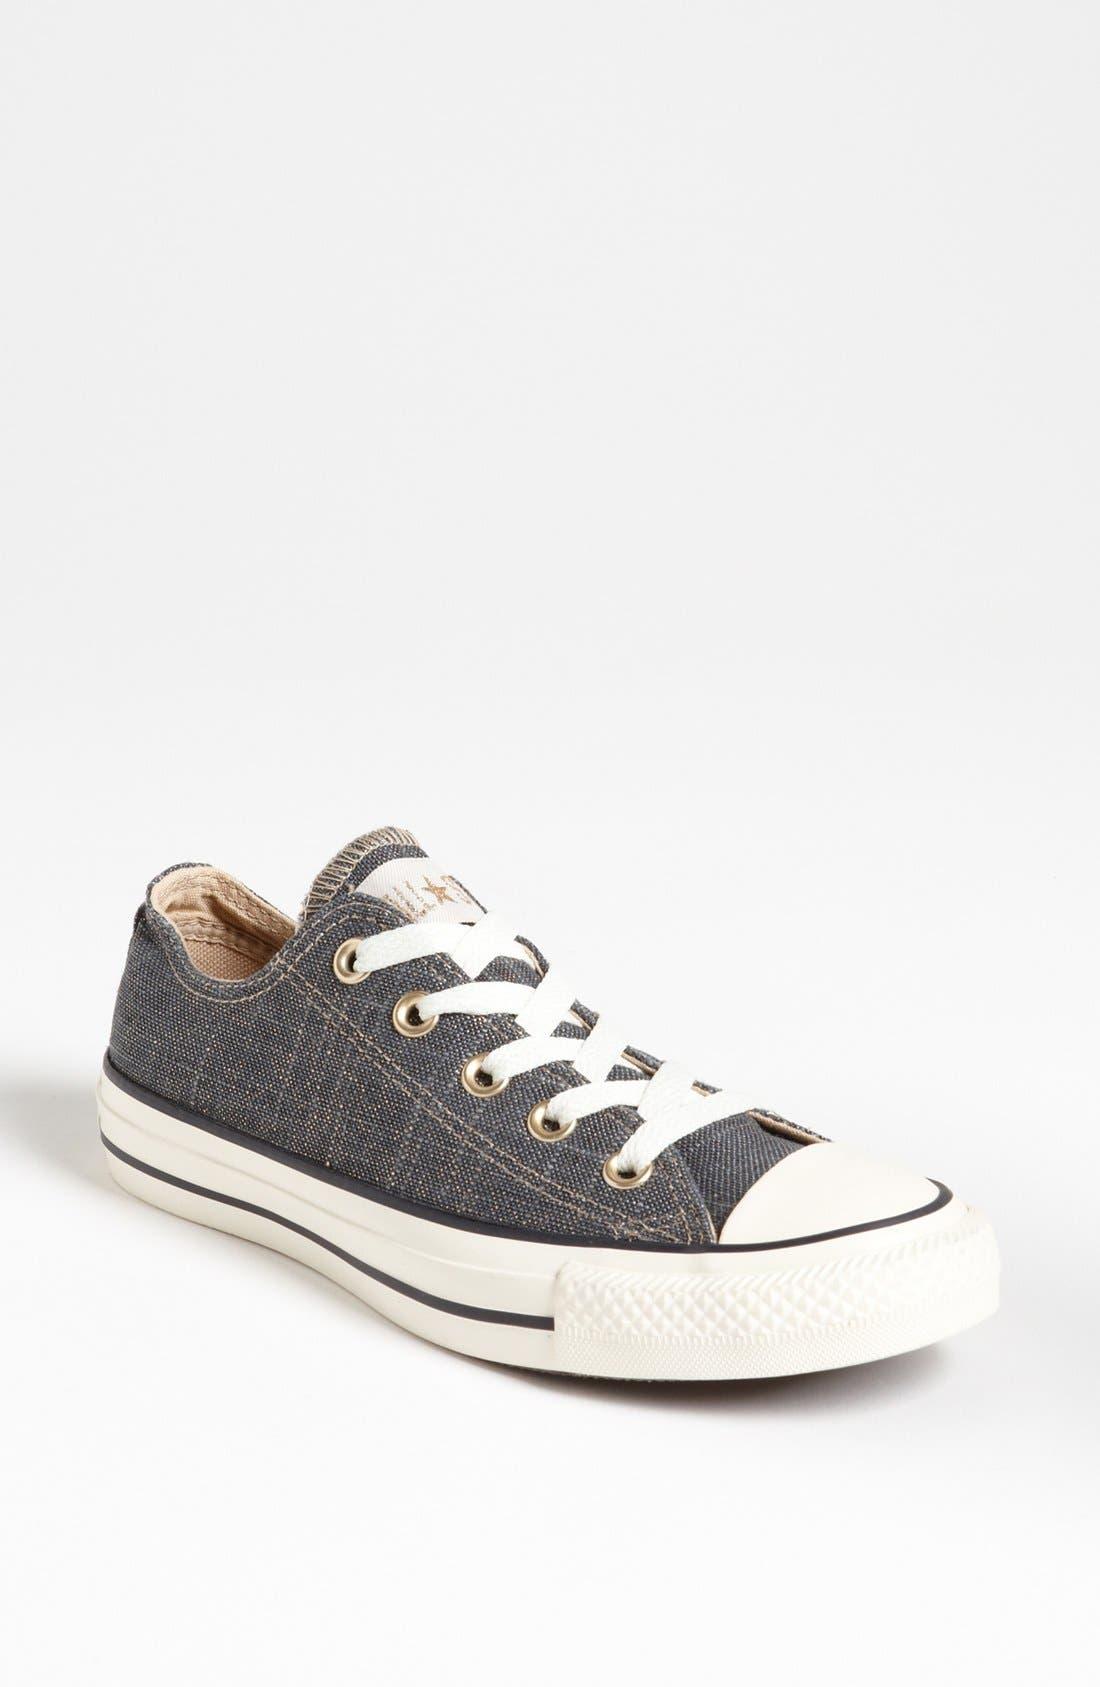 Main Image - Converse Chuck Taylor® All Star® 'Textured' Sneaker (Women)